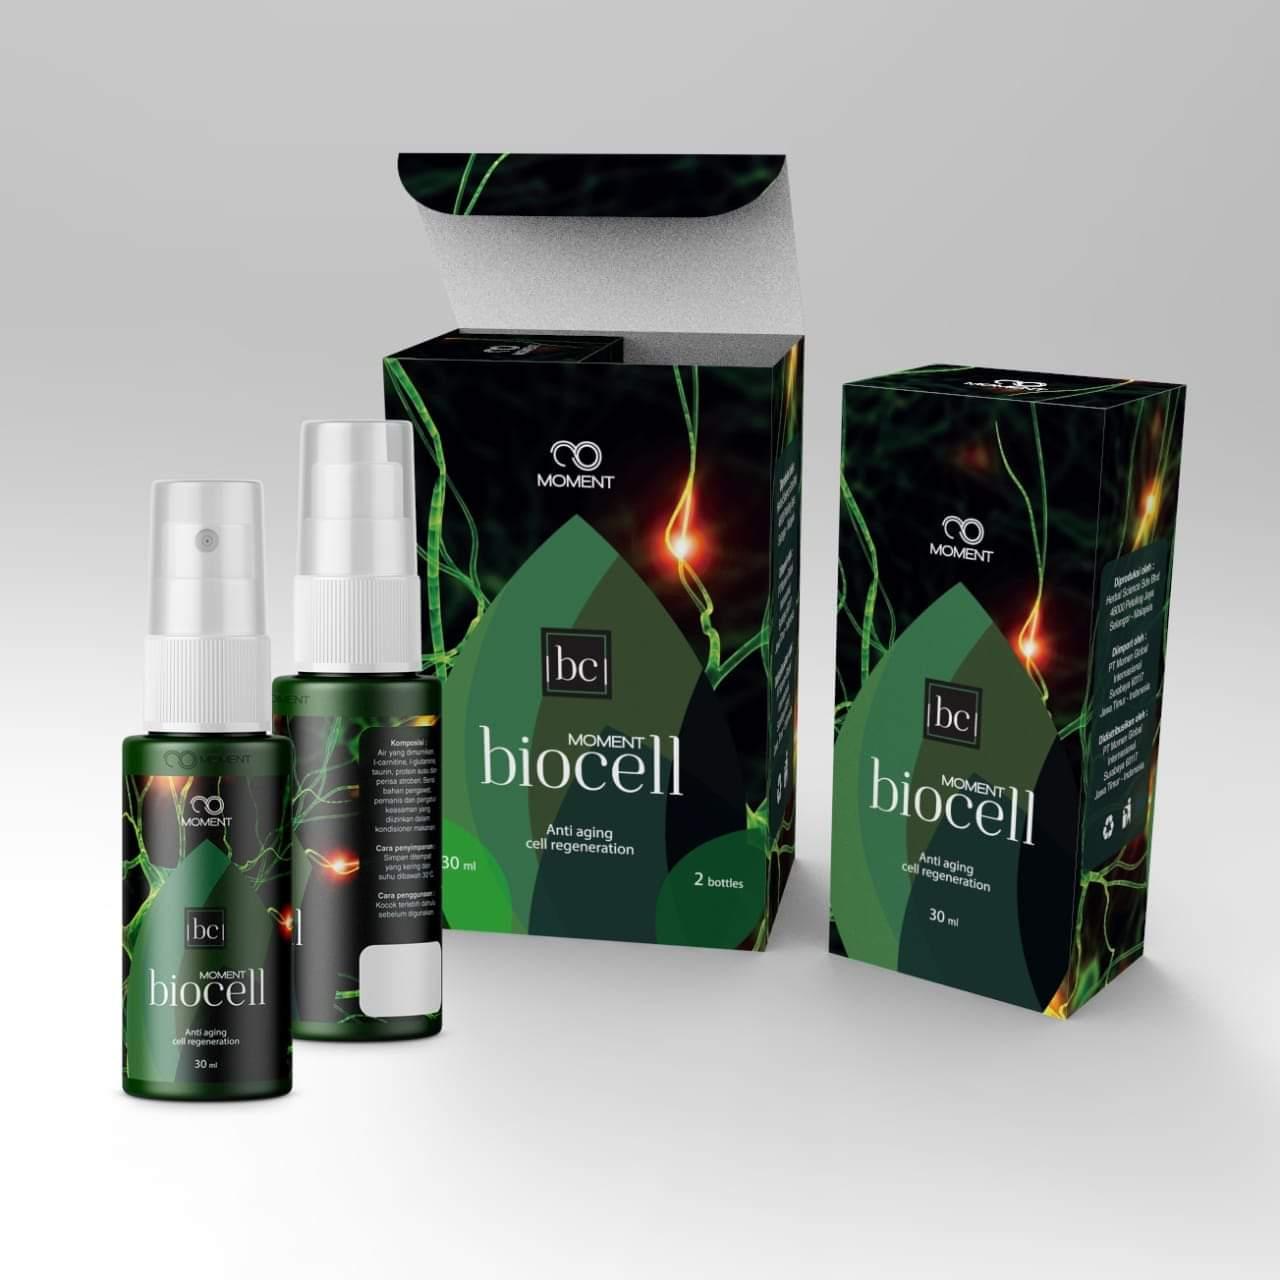 biocell untuk bopeng (2)